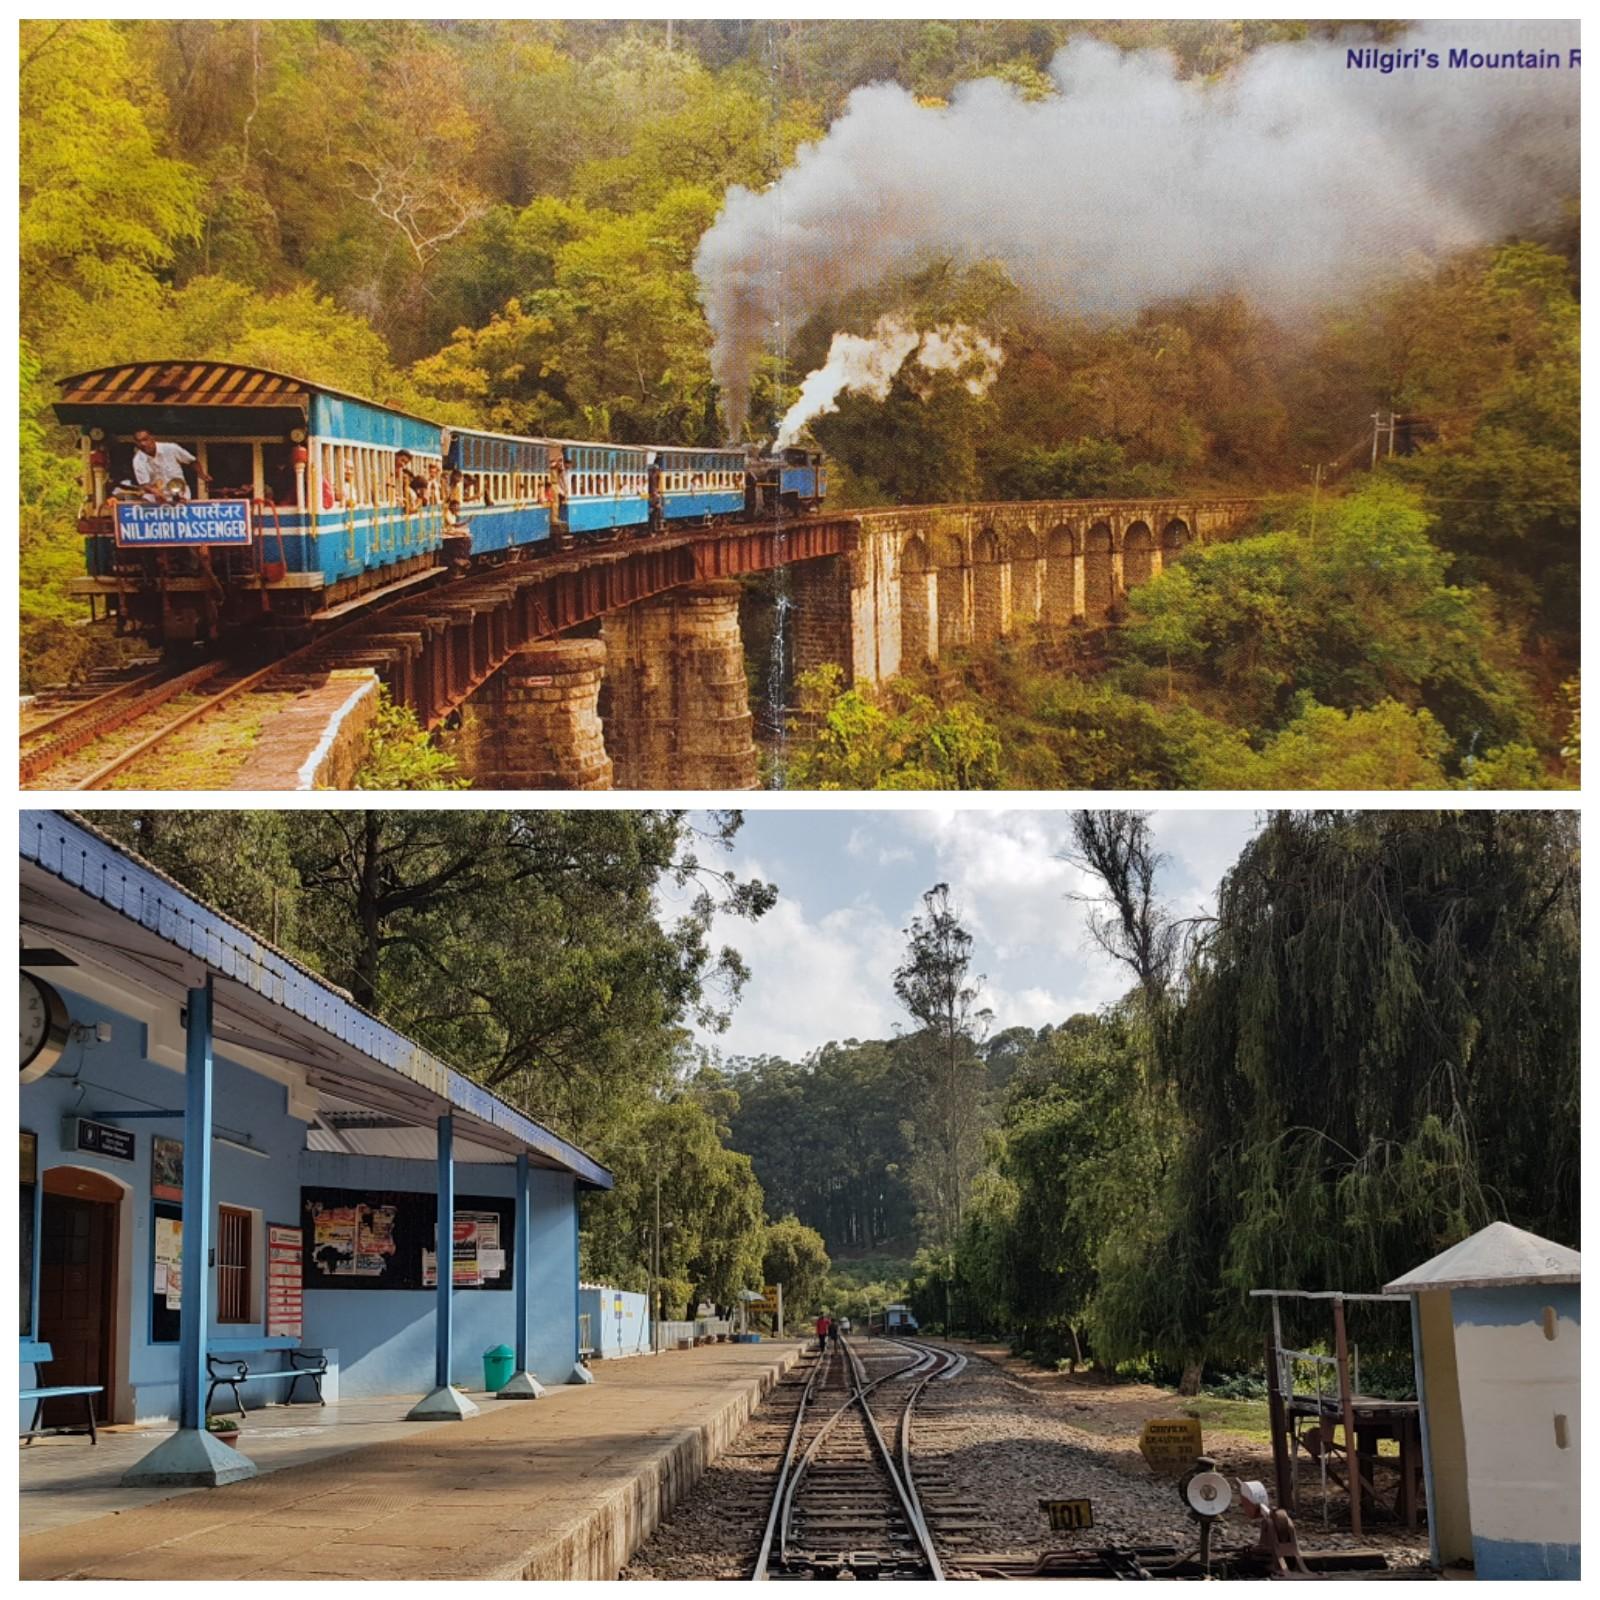 Ooty, the Nilgiris District: Nilgiri Mountain Railway